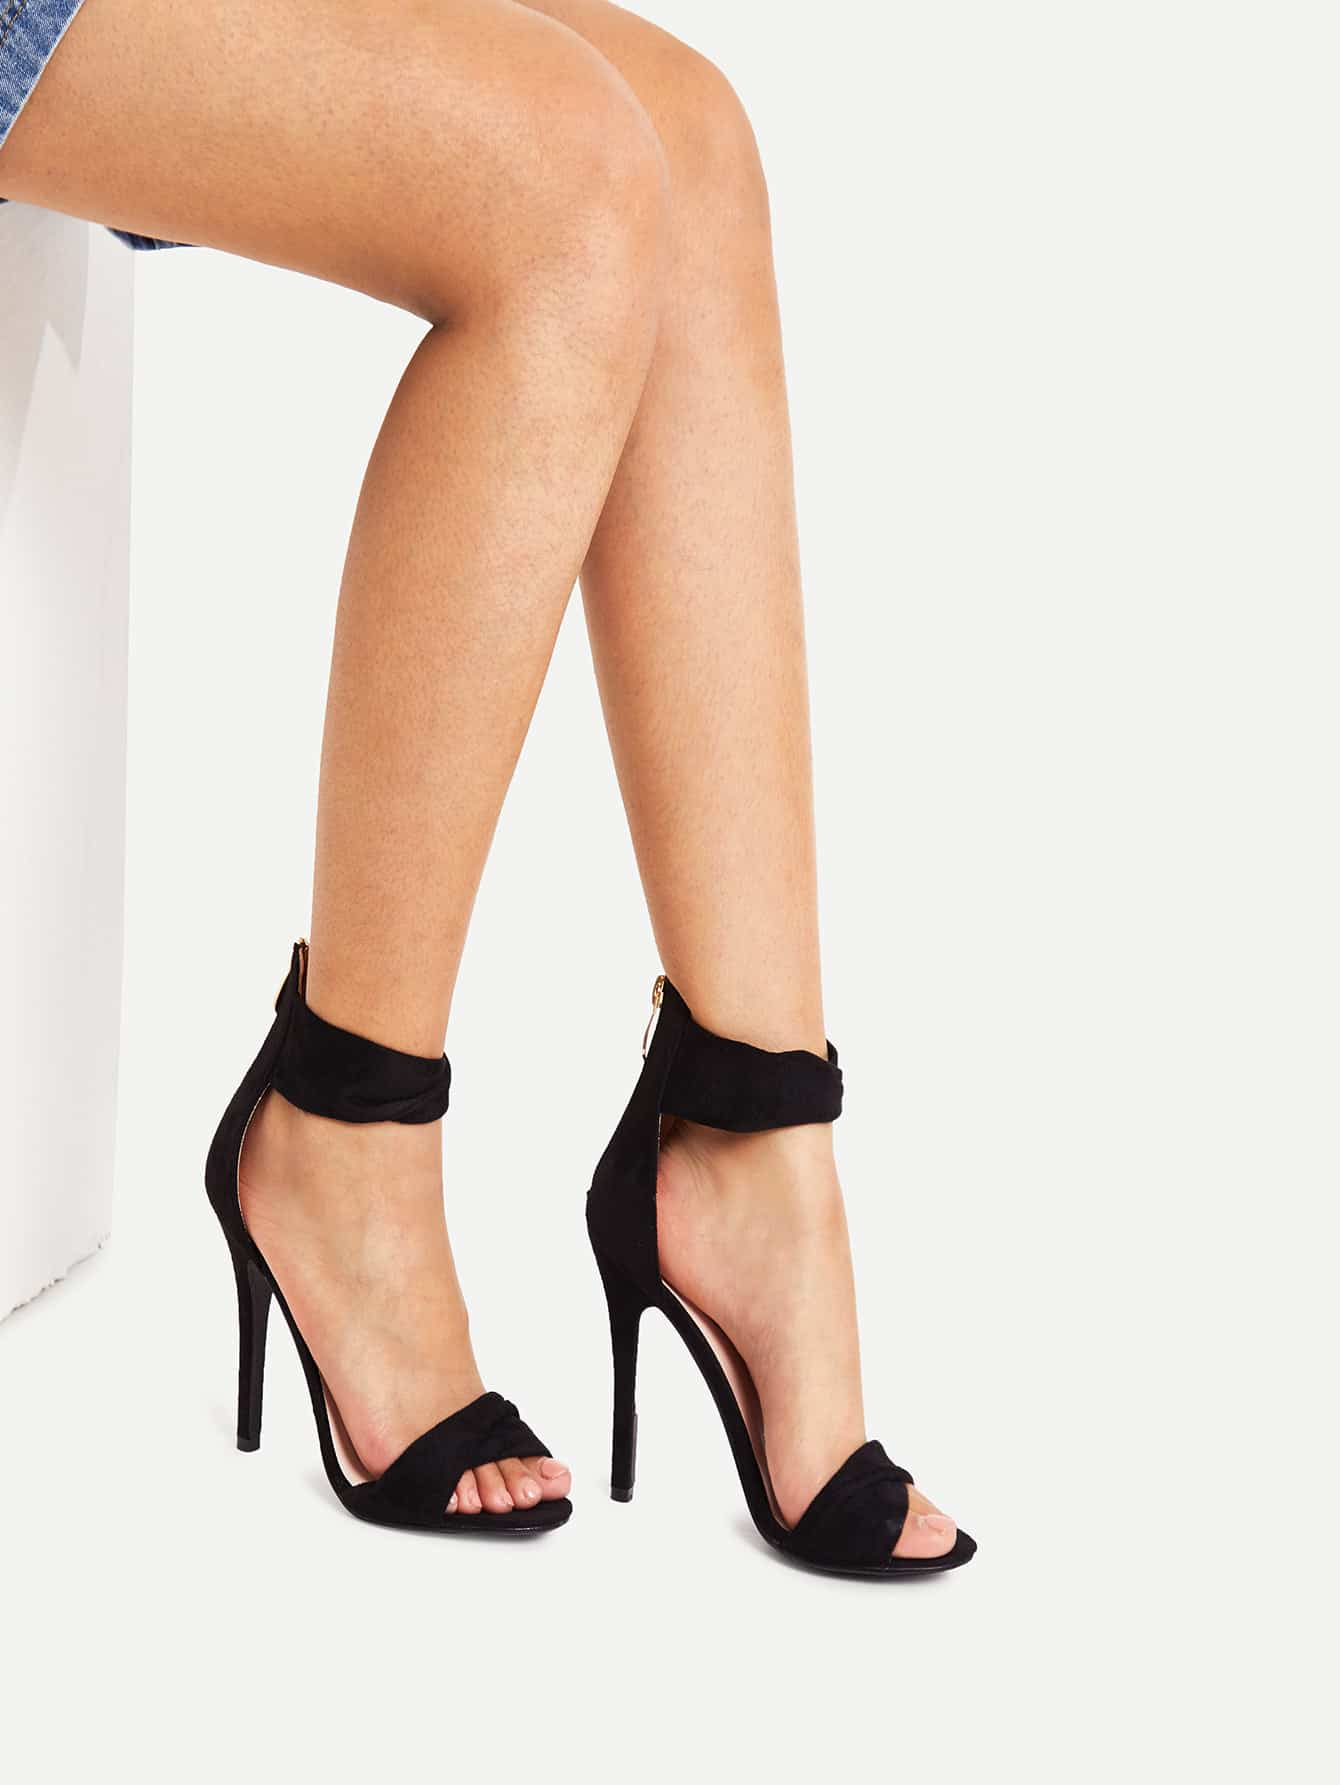 Wrap Design Back Zipper Heeled Sandals shoes180202310